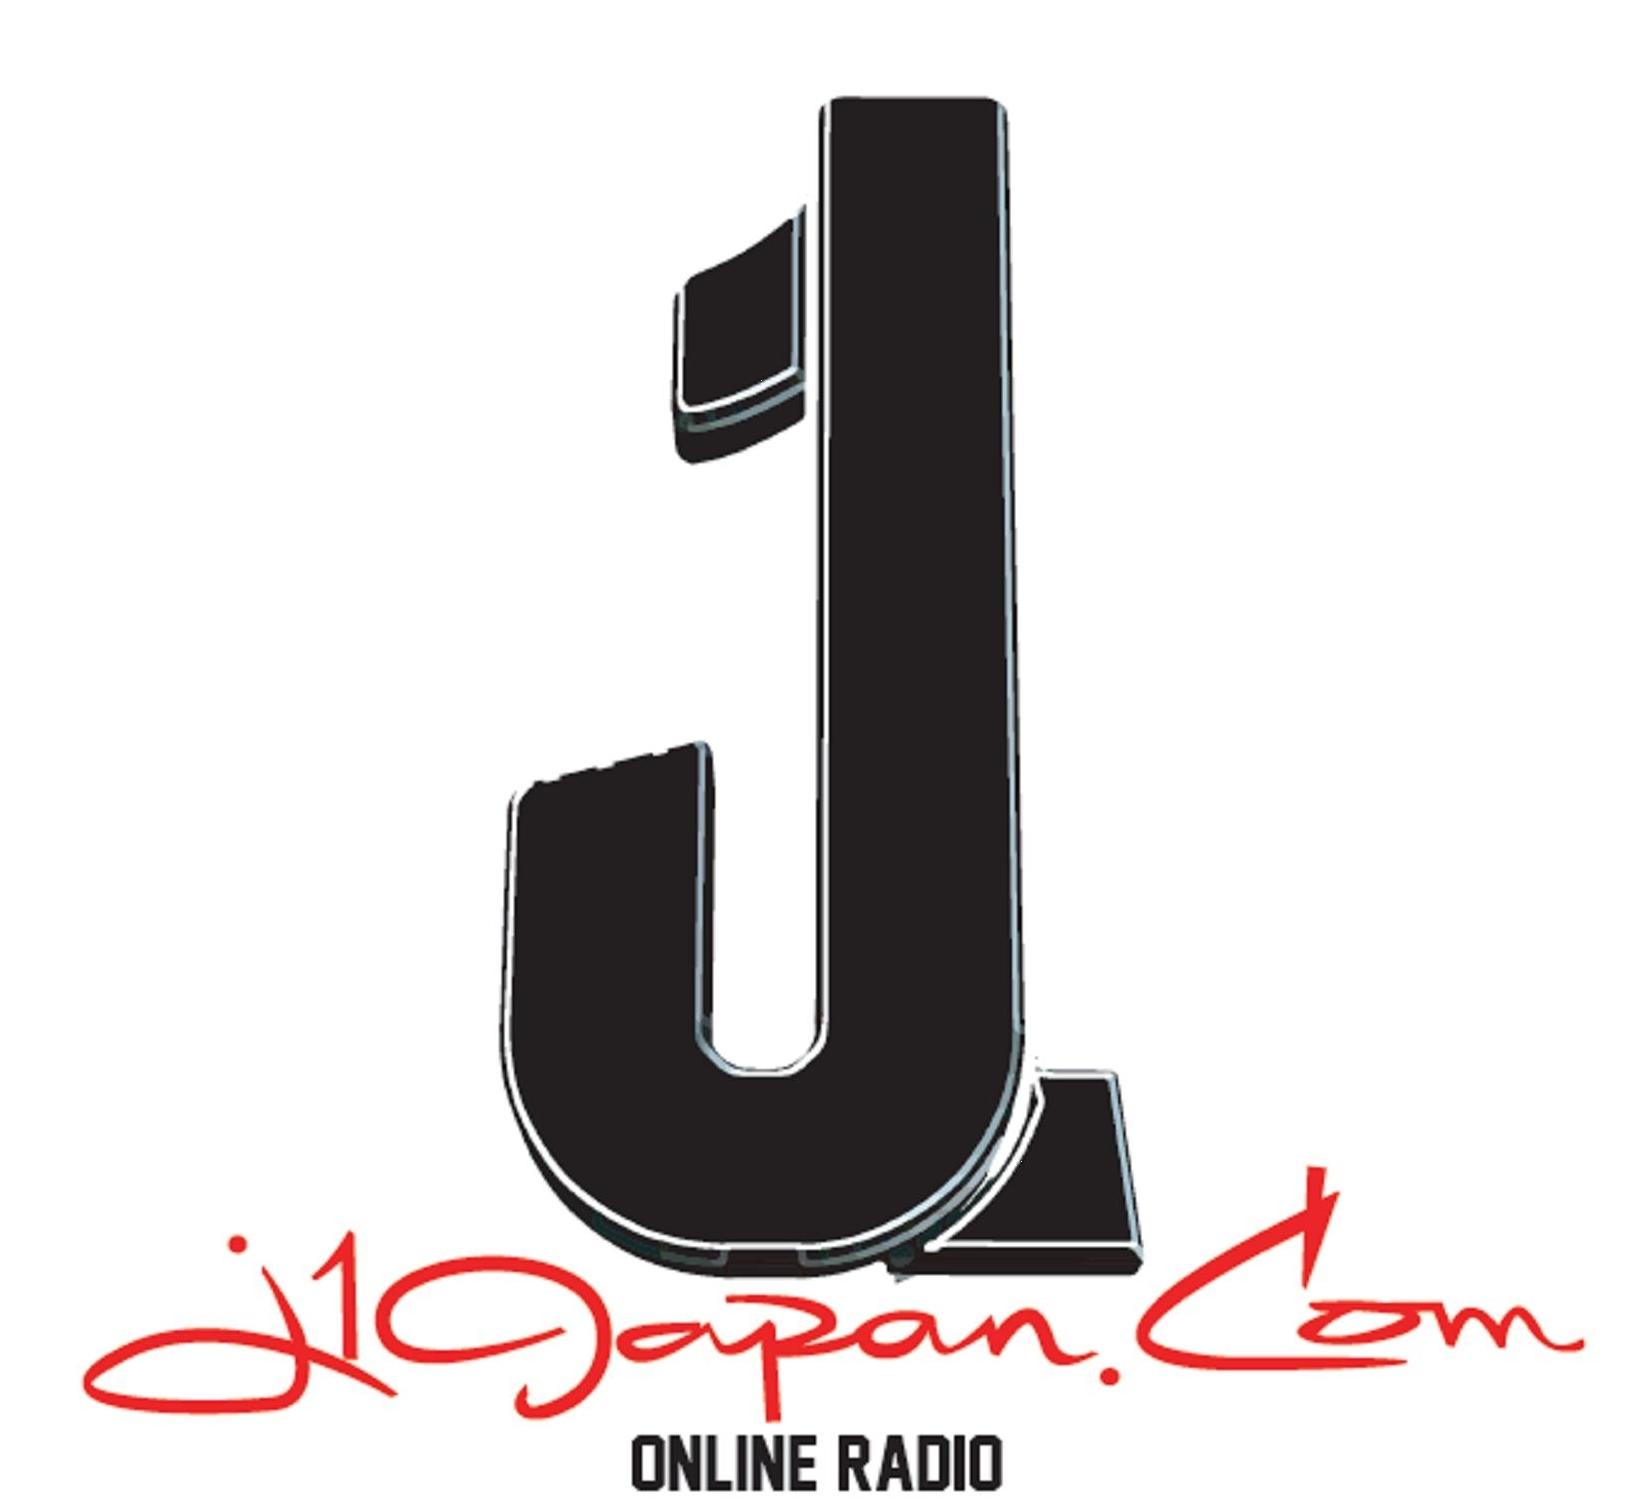 J1Japan.com Online Radio.jpg